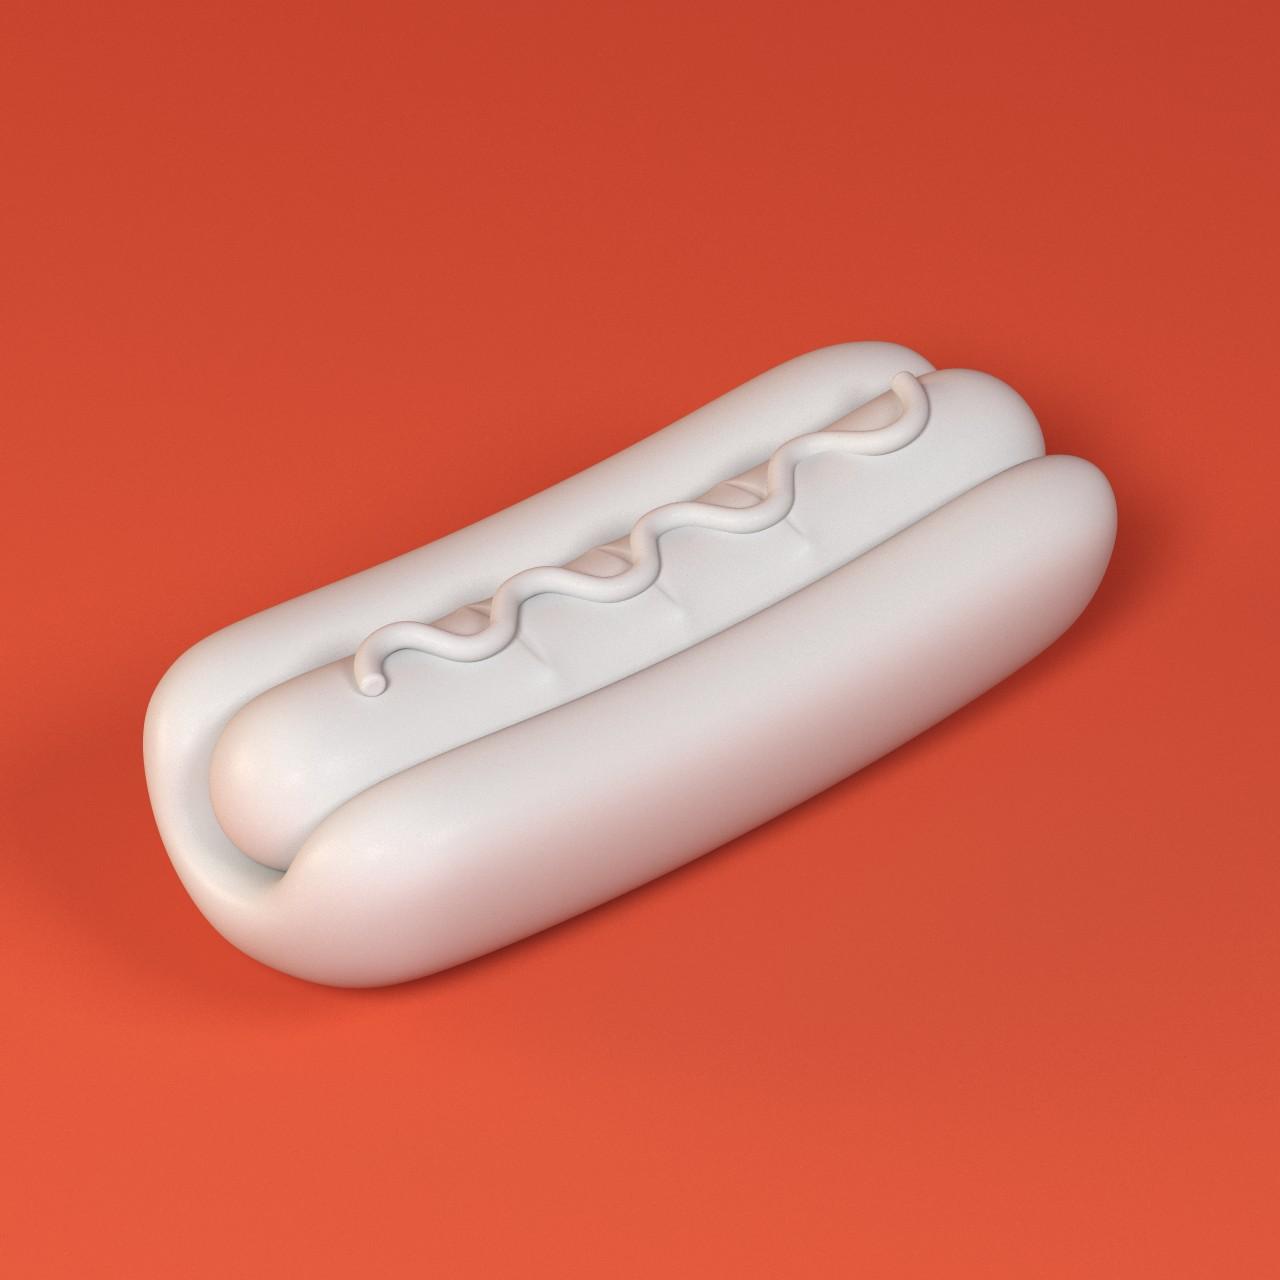 hotdog_1.jpg